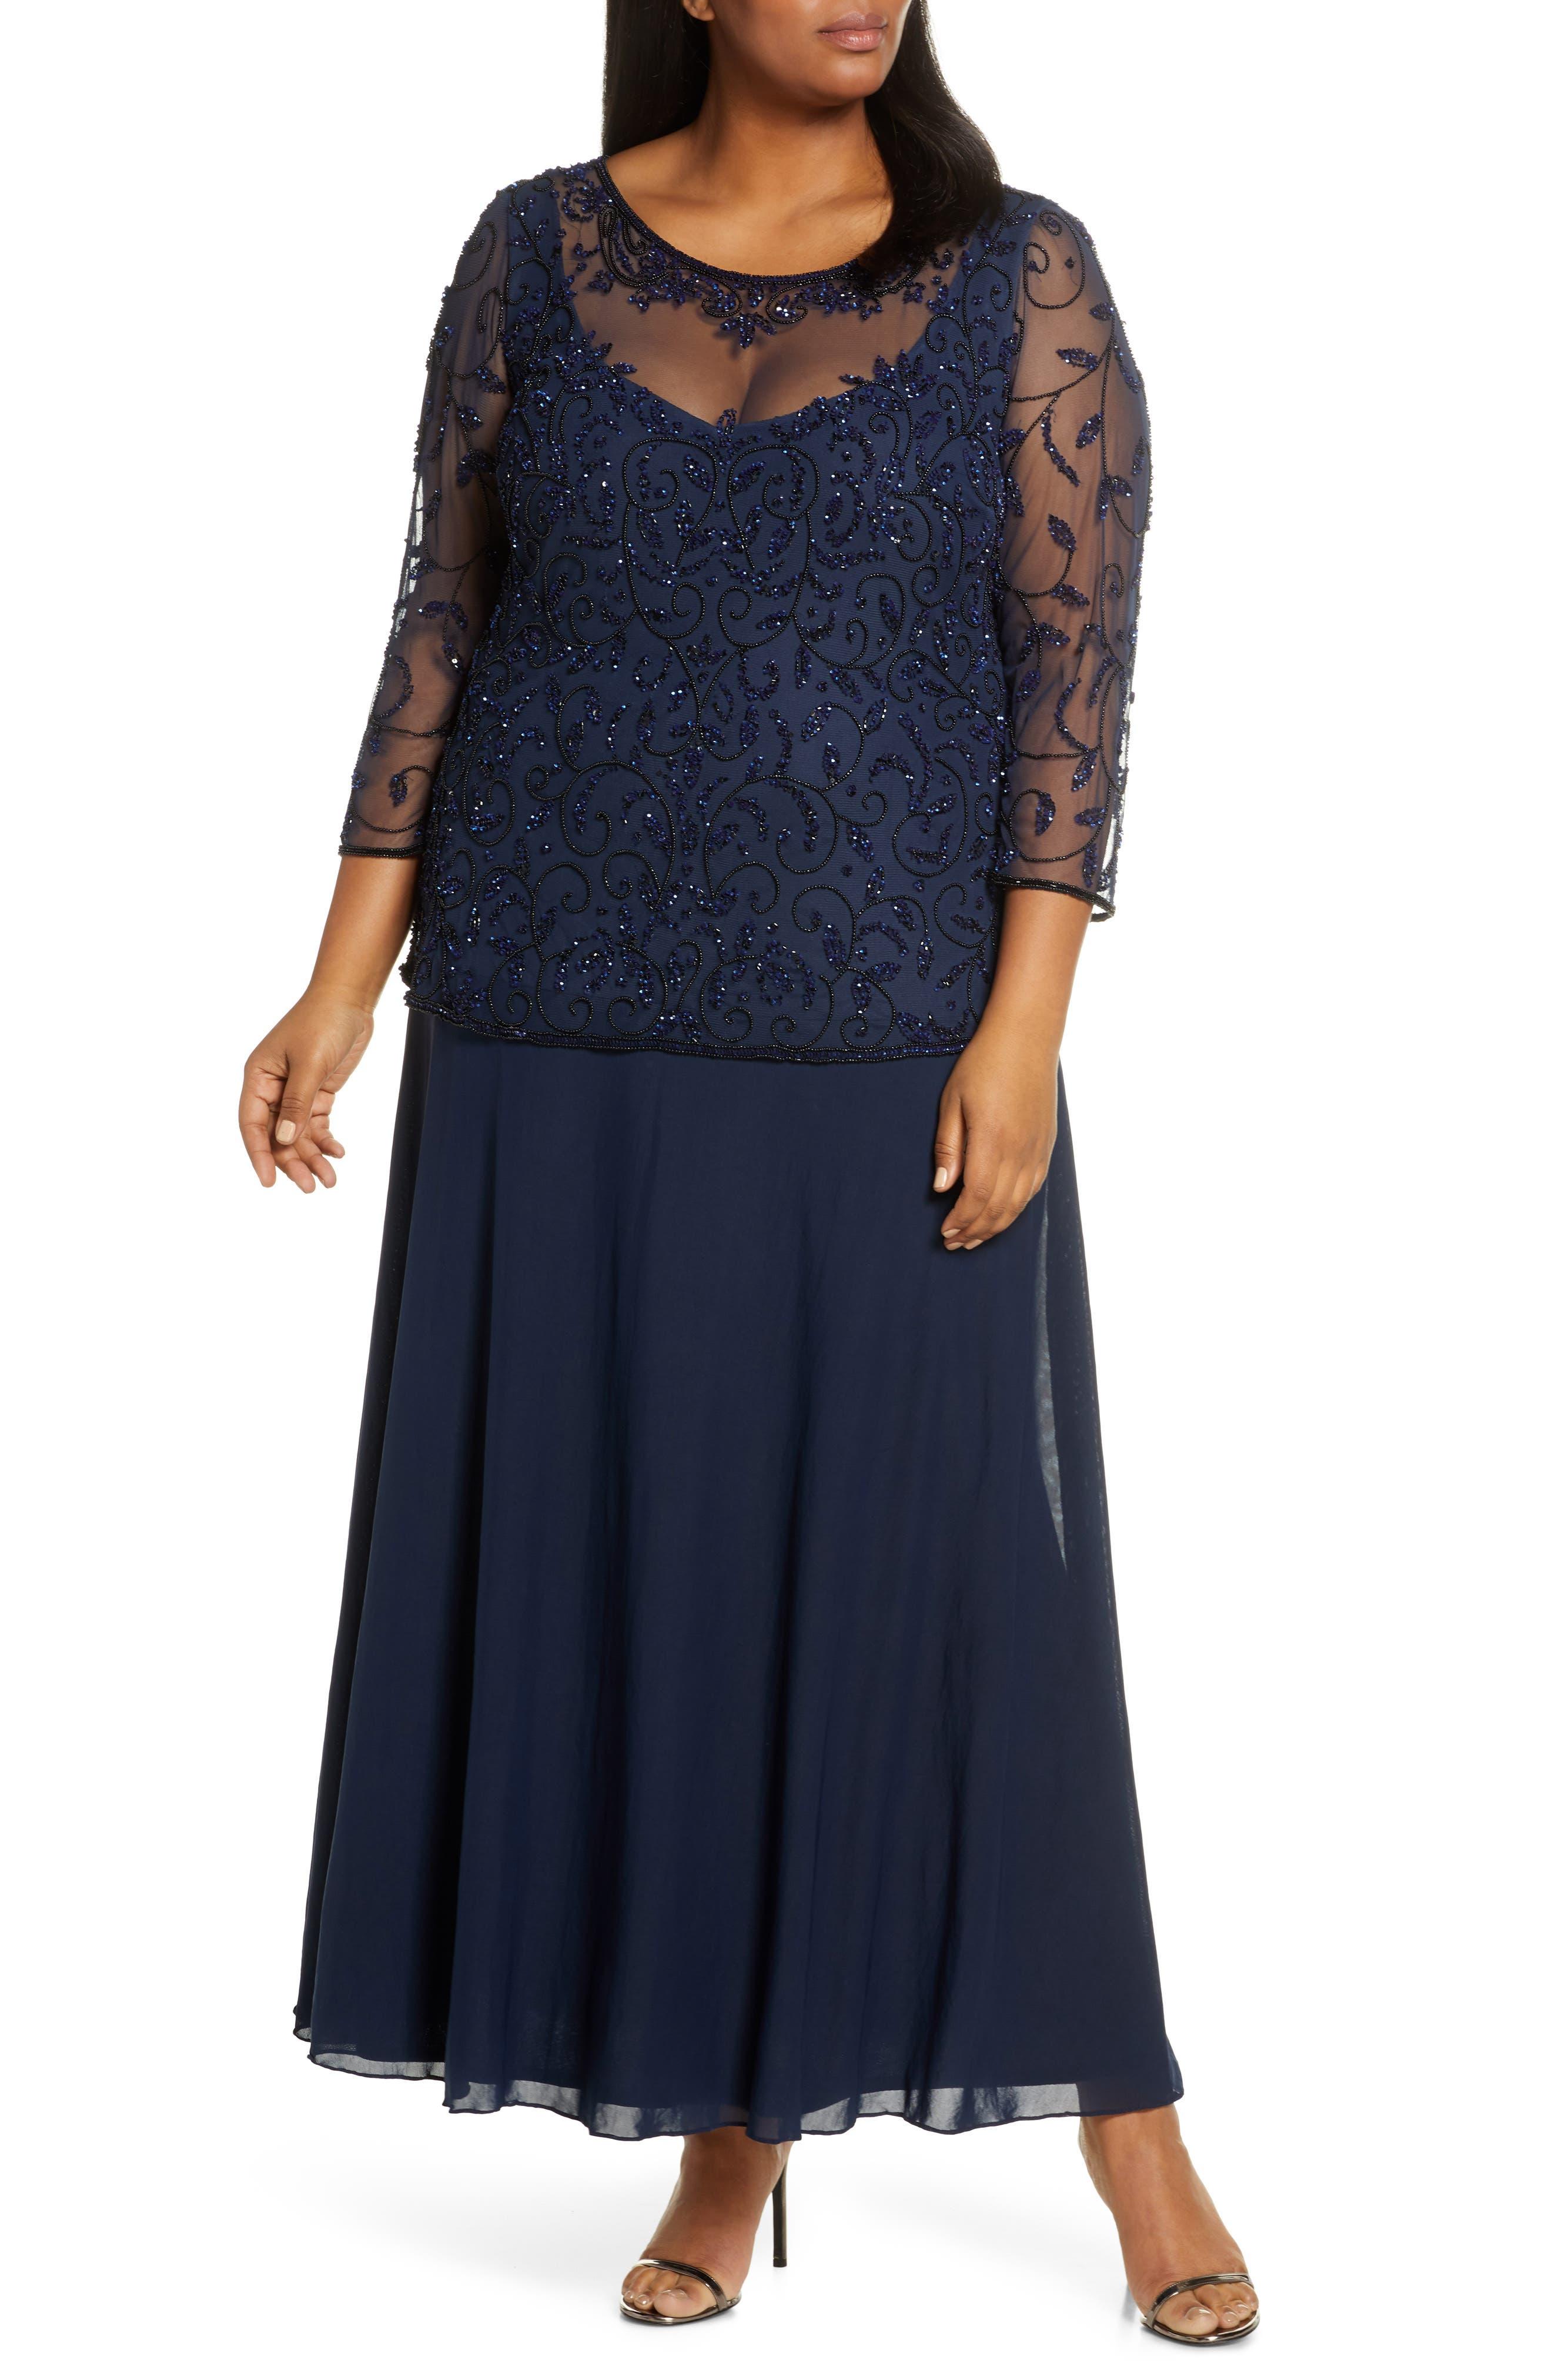 Plus Size Vintage Dresses, Plus Size Retro Dresses Plus Size Womens Pissaro Nights Beaded Mesh Mock Two-Piece Gown Size 20W - Blue $248.00 AT vintagedancer.com